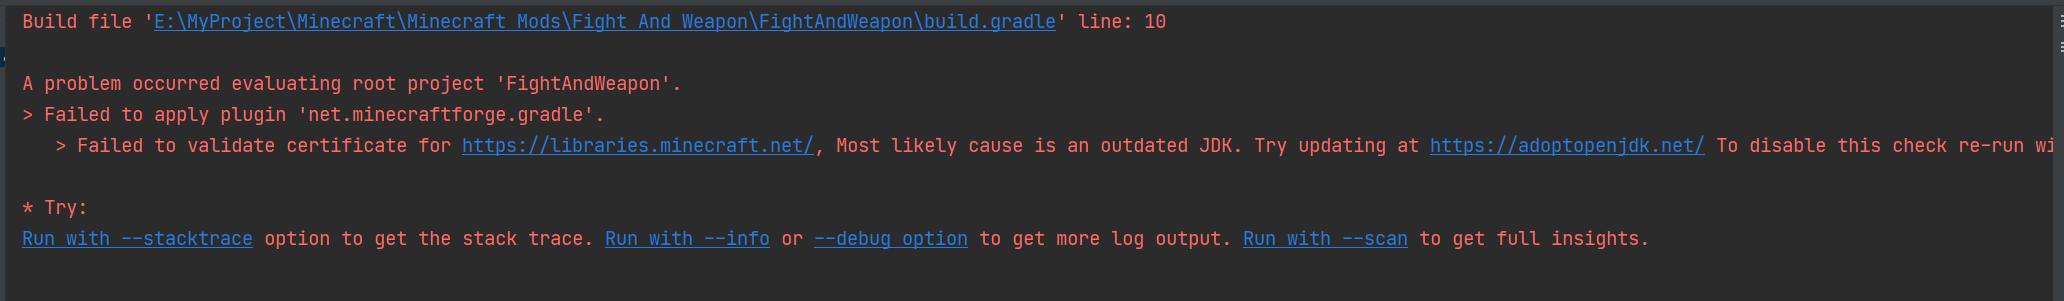 Failed to apply plugin 'net.minecraftforge.gradle'